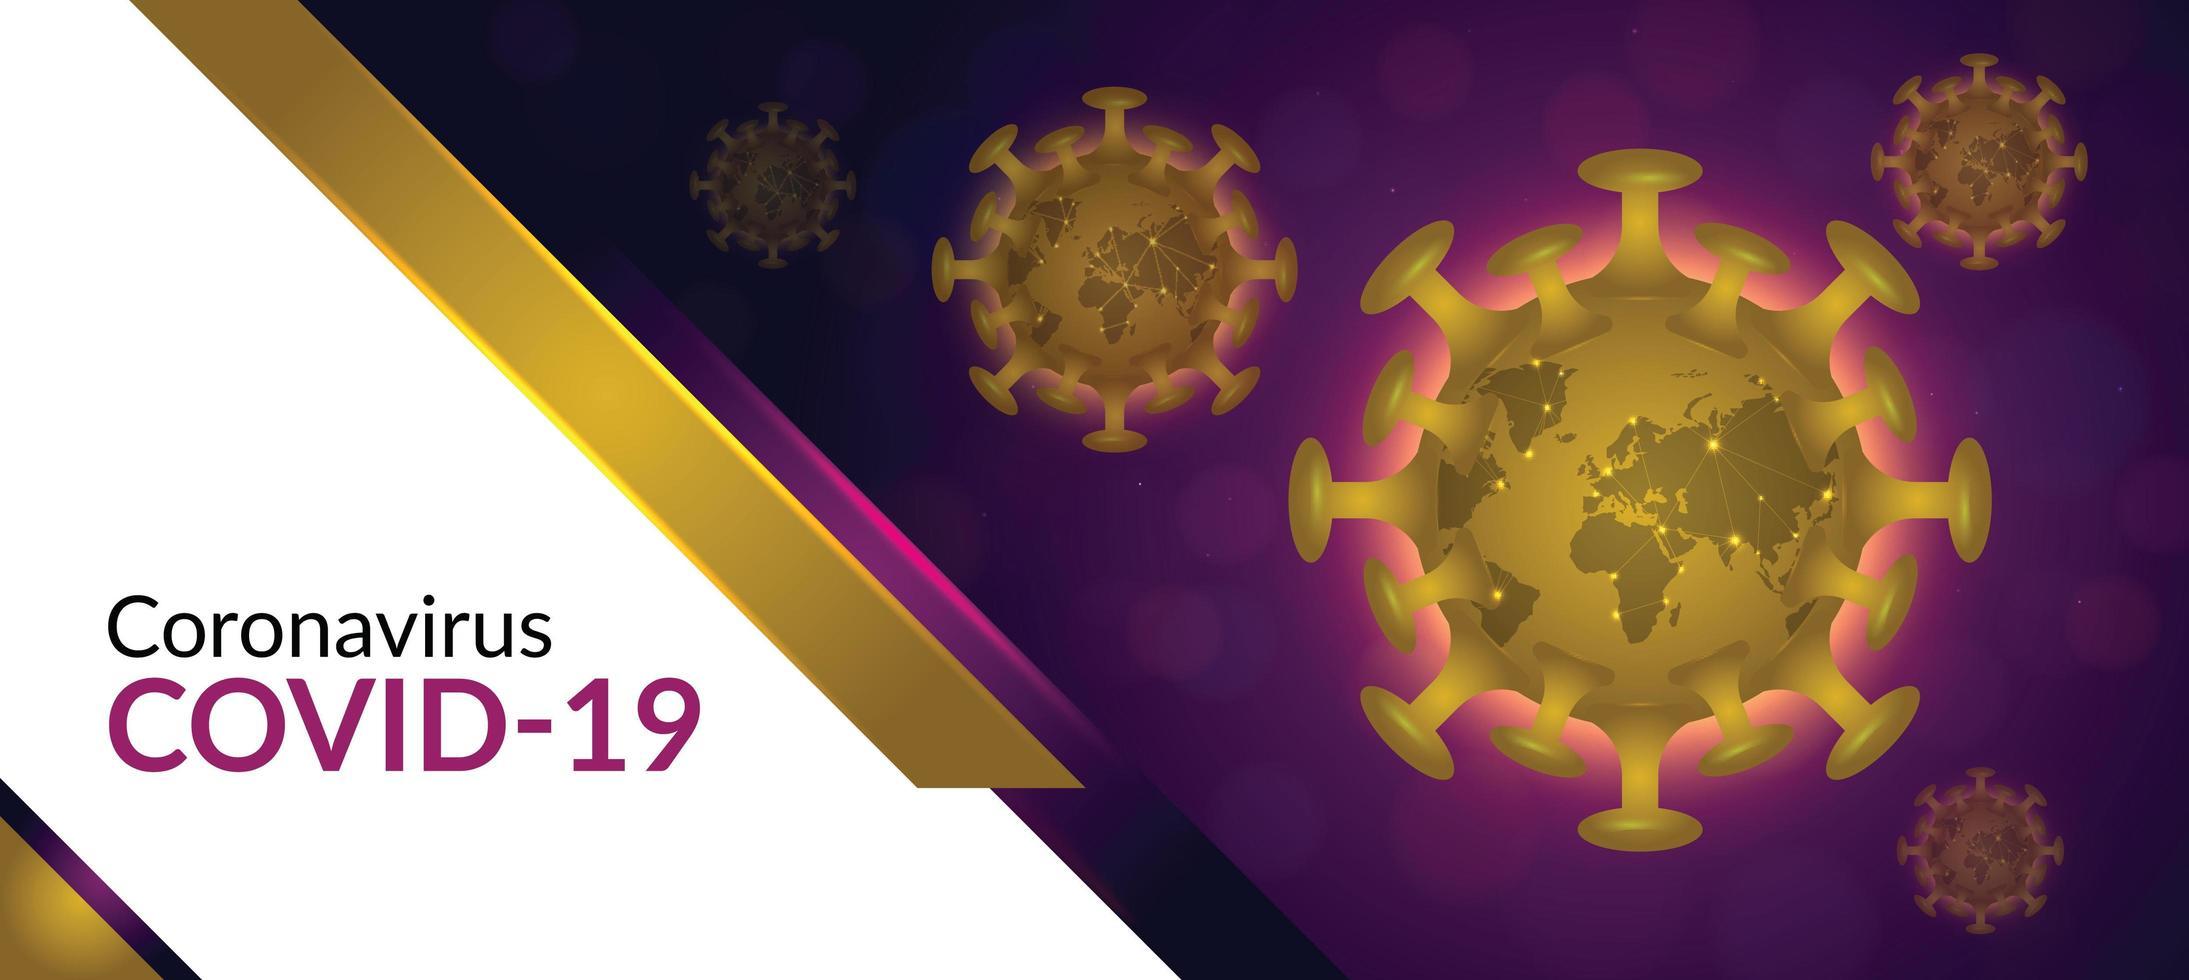 banner coronavirus viola e oro vettore